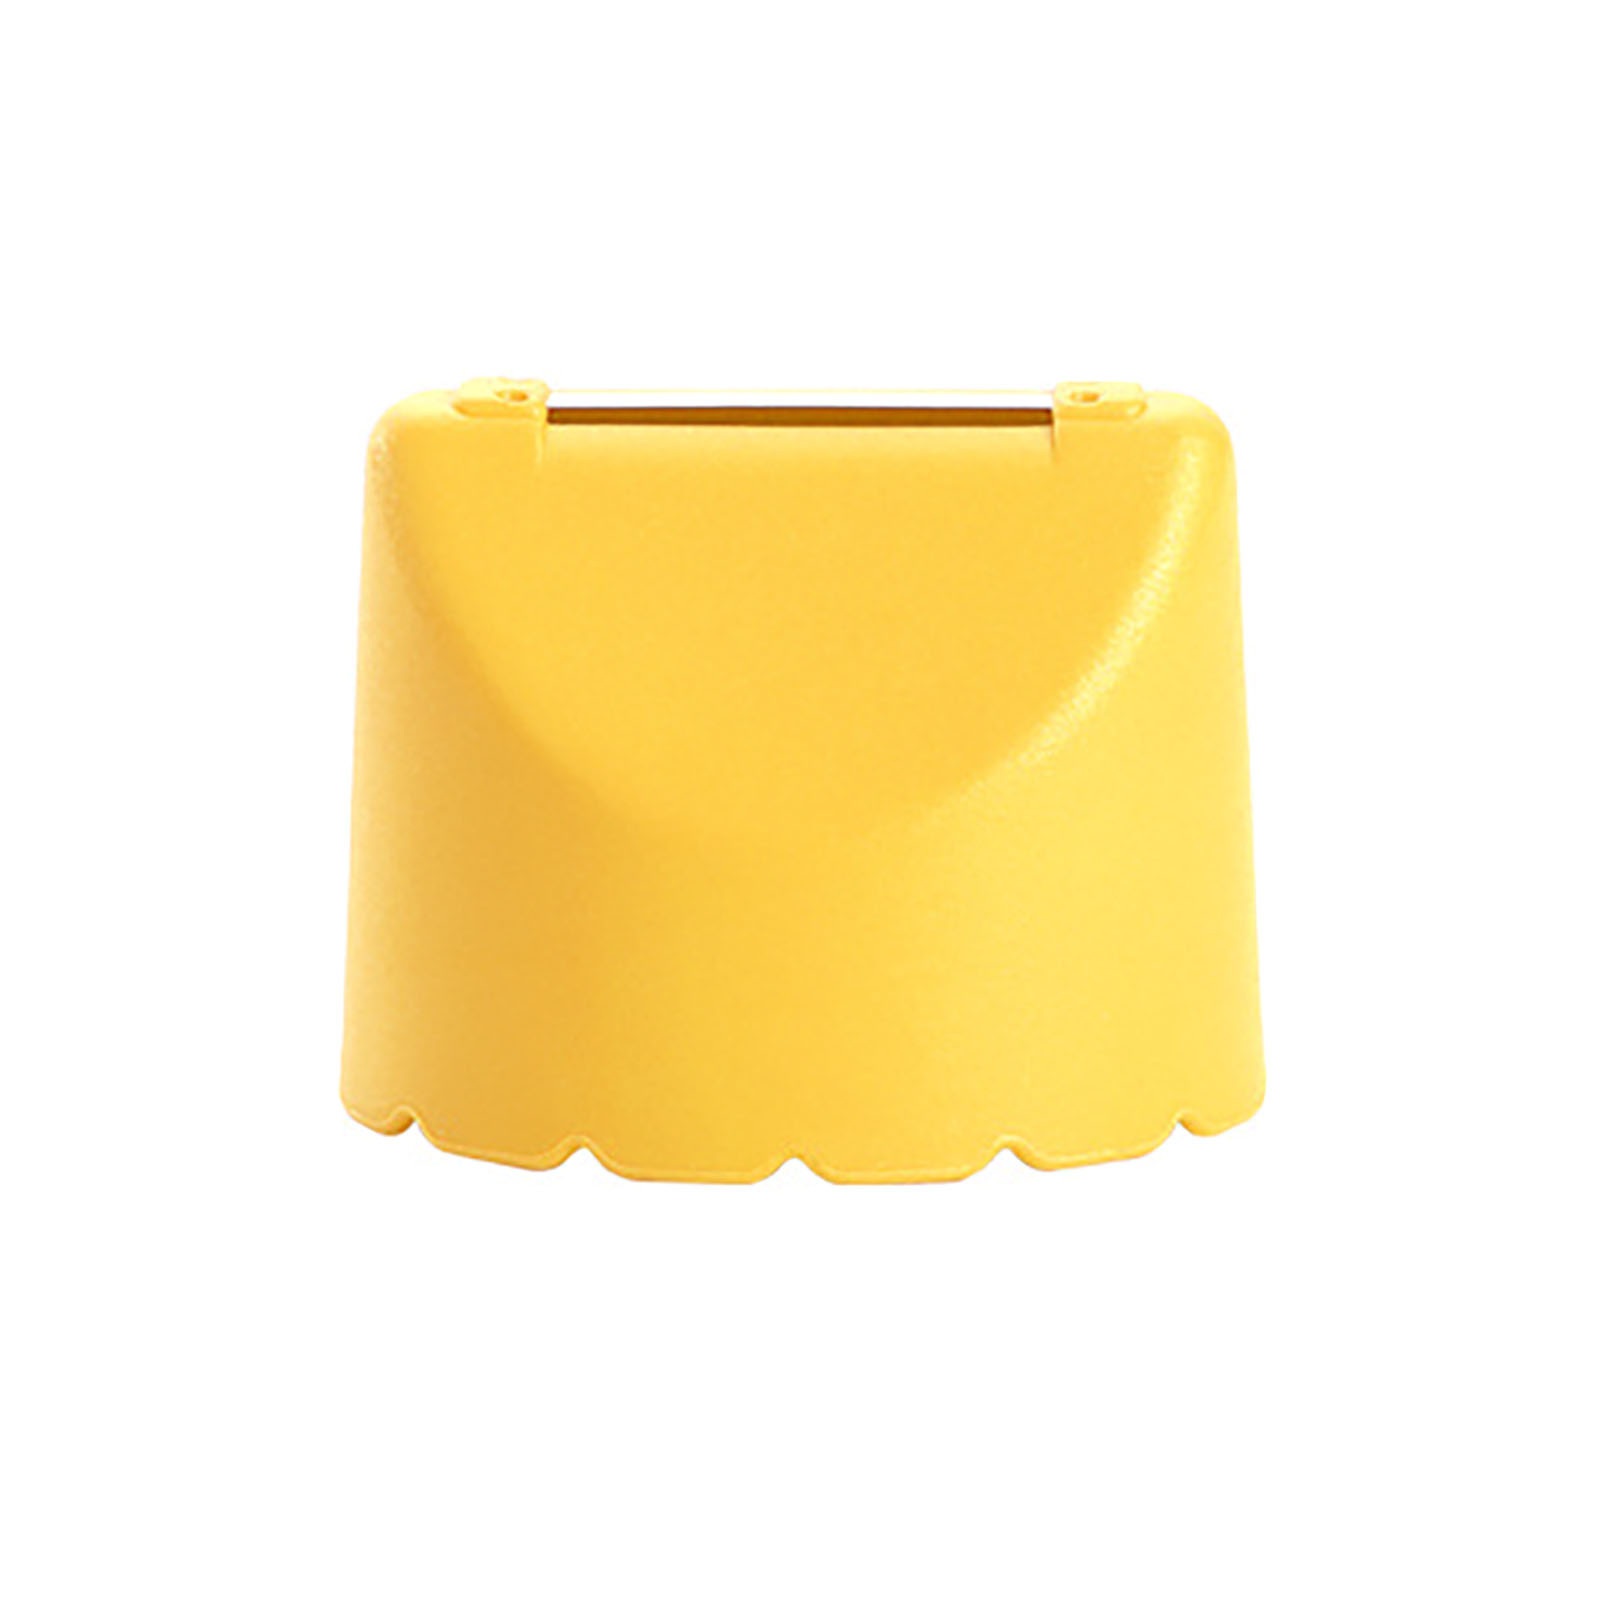 Anti-splash  Peeler Multifunctional Peeler For Fruit Vegetable Kitchen Accessories Yellow